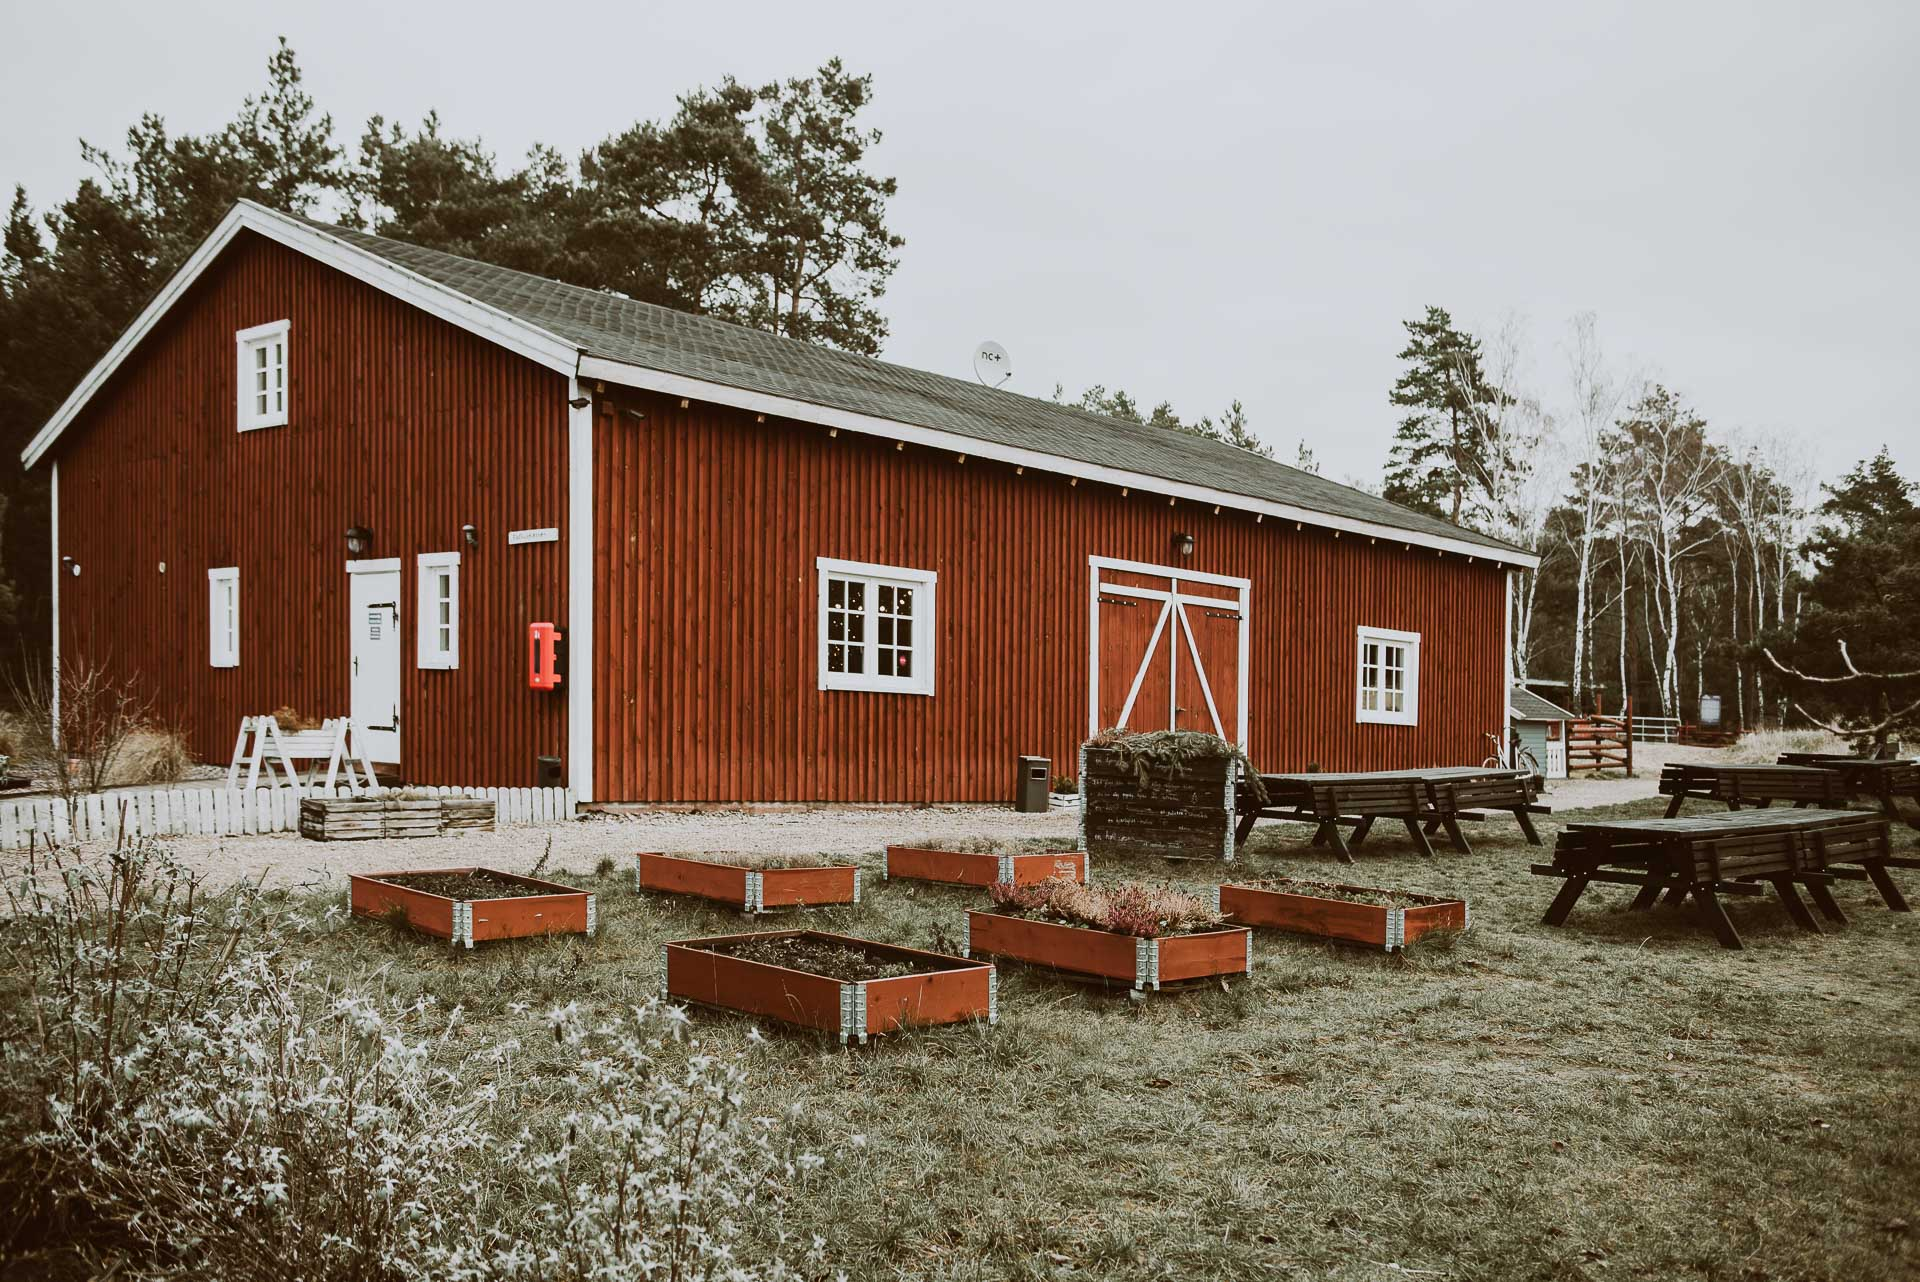 Arendel Wioska Norweska - stodoła